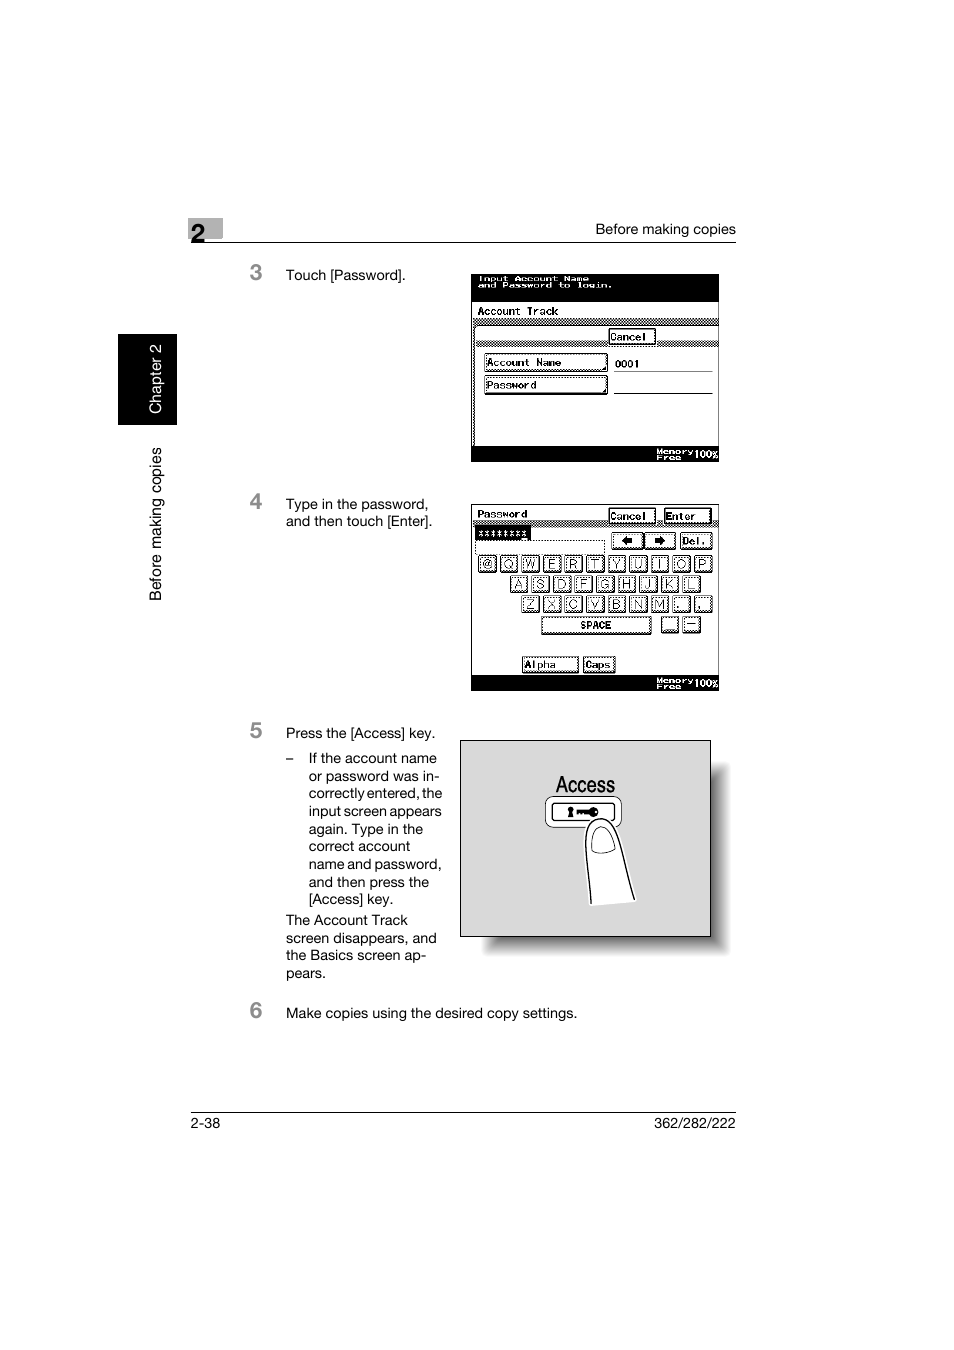 access konica minolta bizhub 282 user manual page 87 424 rh manualsdir com bizhub 283 manual Bizhub 362 Drivers